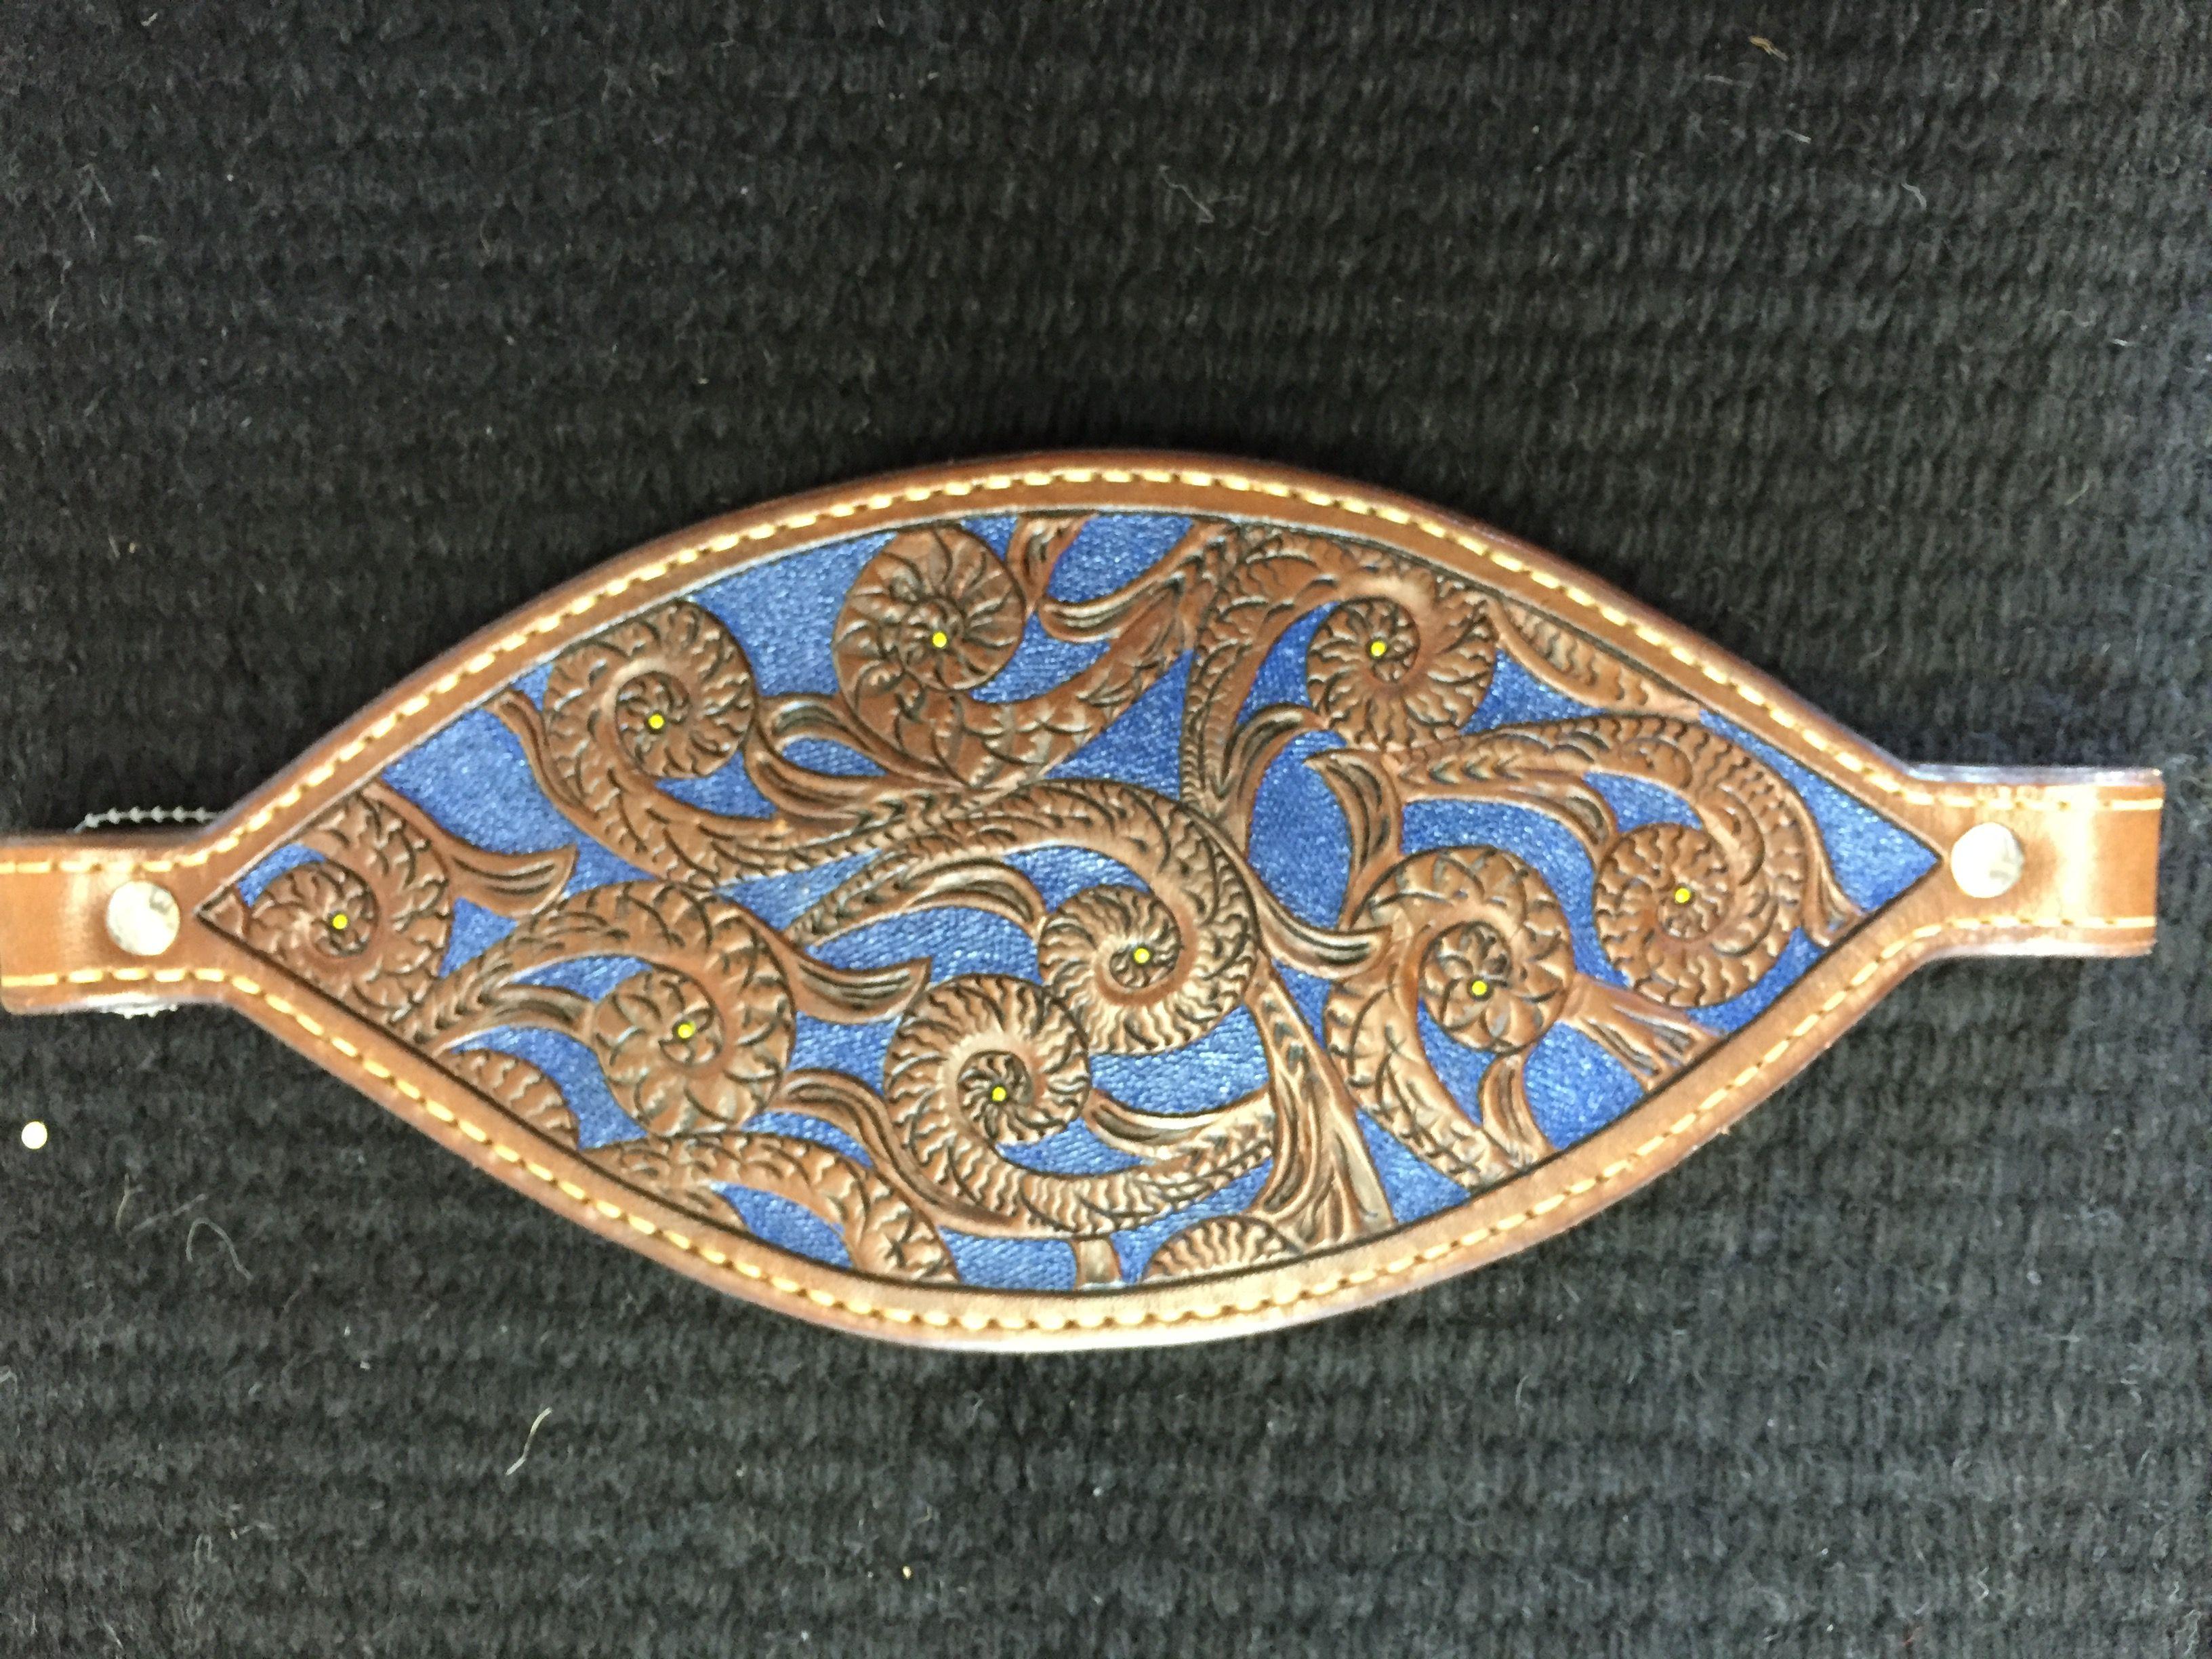 Hand tooled leather bronc halter noseband hand tooled leather hand tooled leather bronc halter noseband maxwellsz